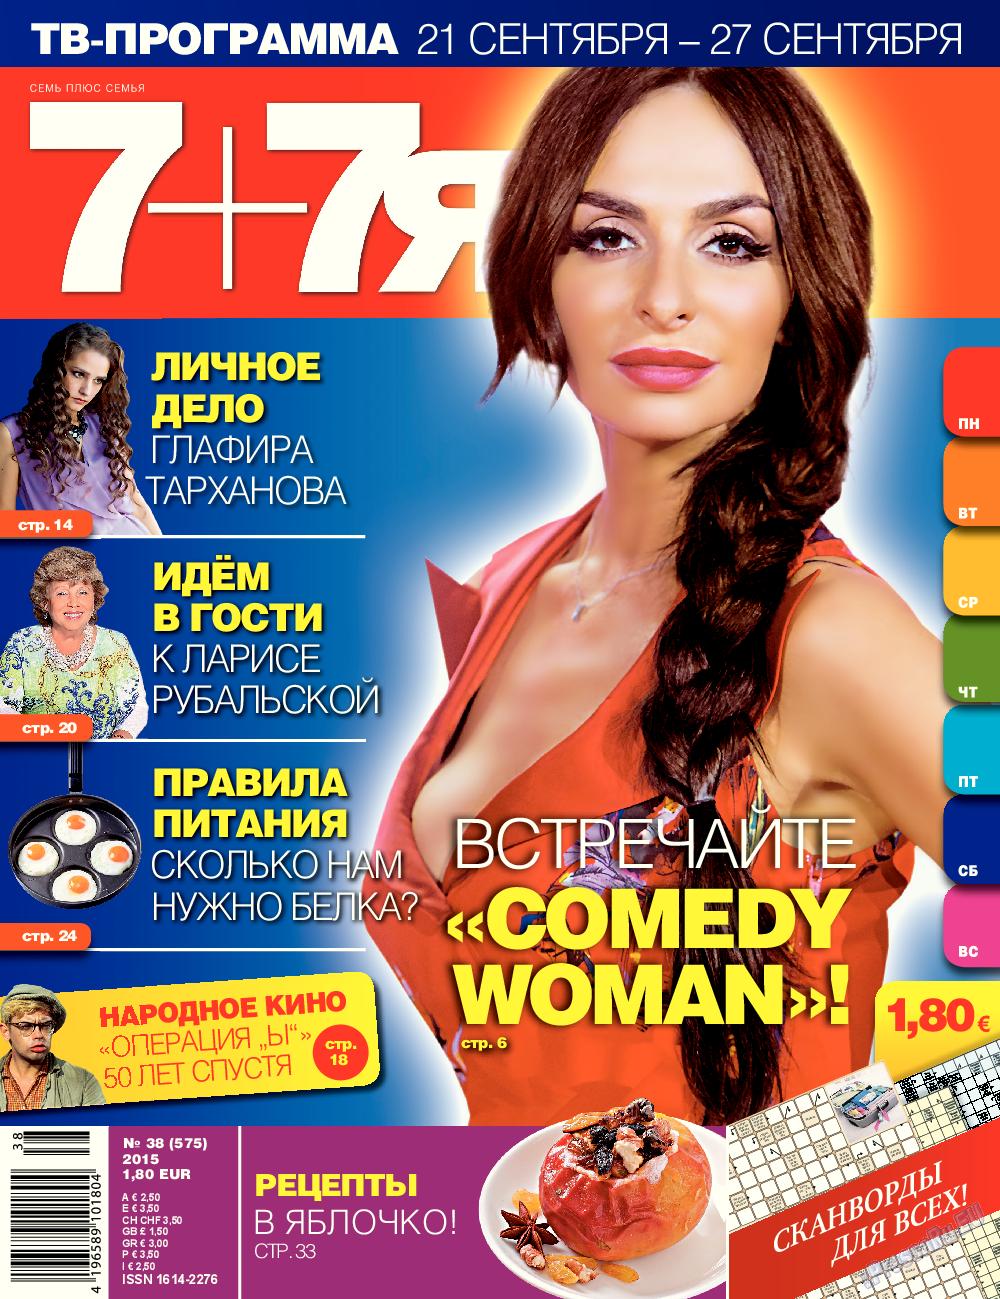 7плюс7я (журнал). 2015 год, номер 38, стр. 1